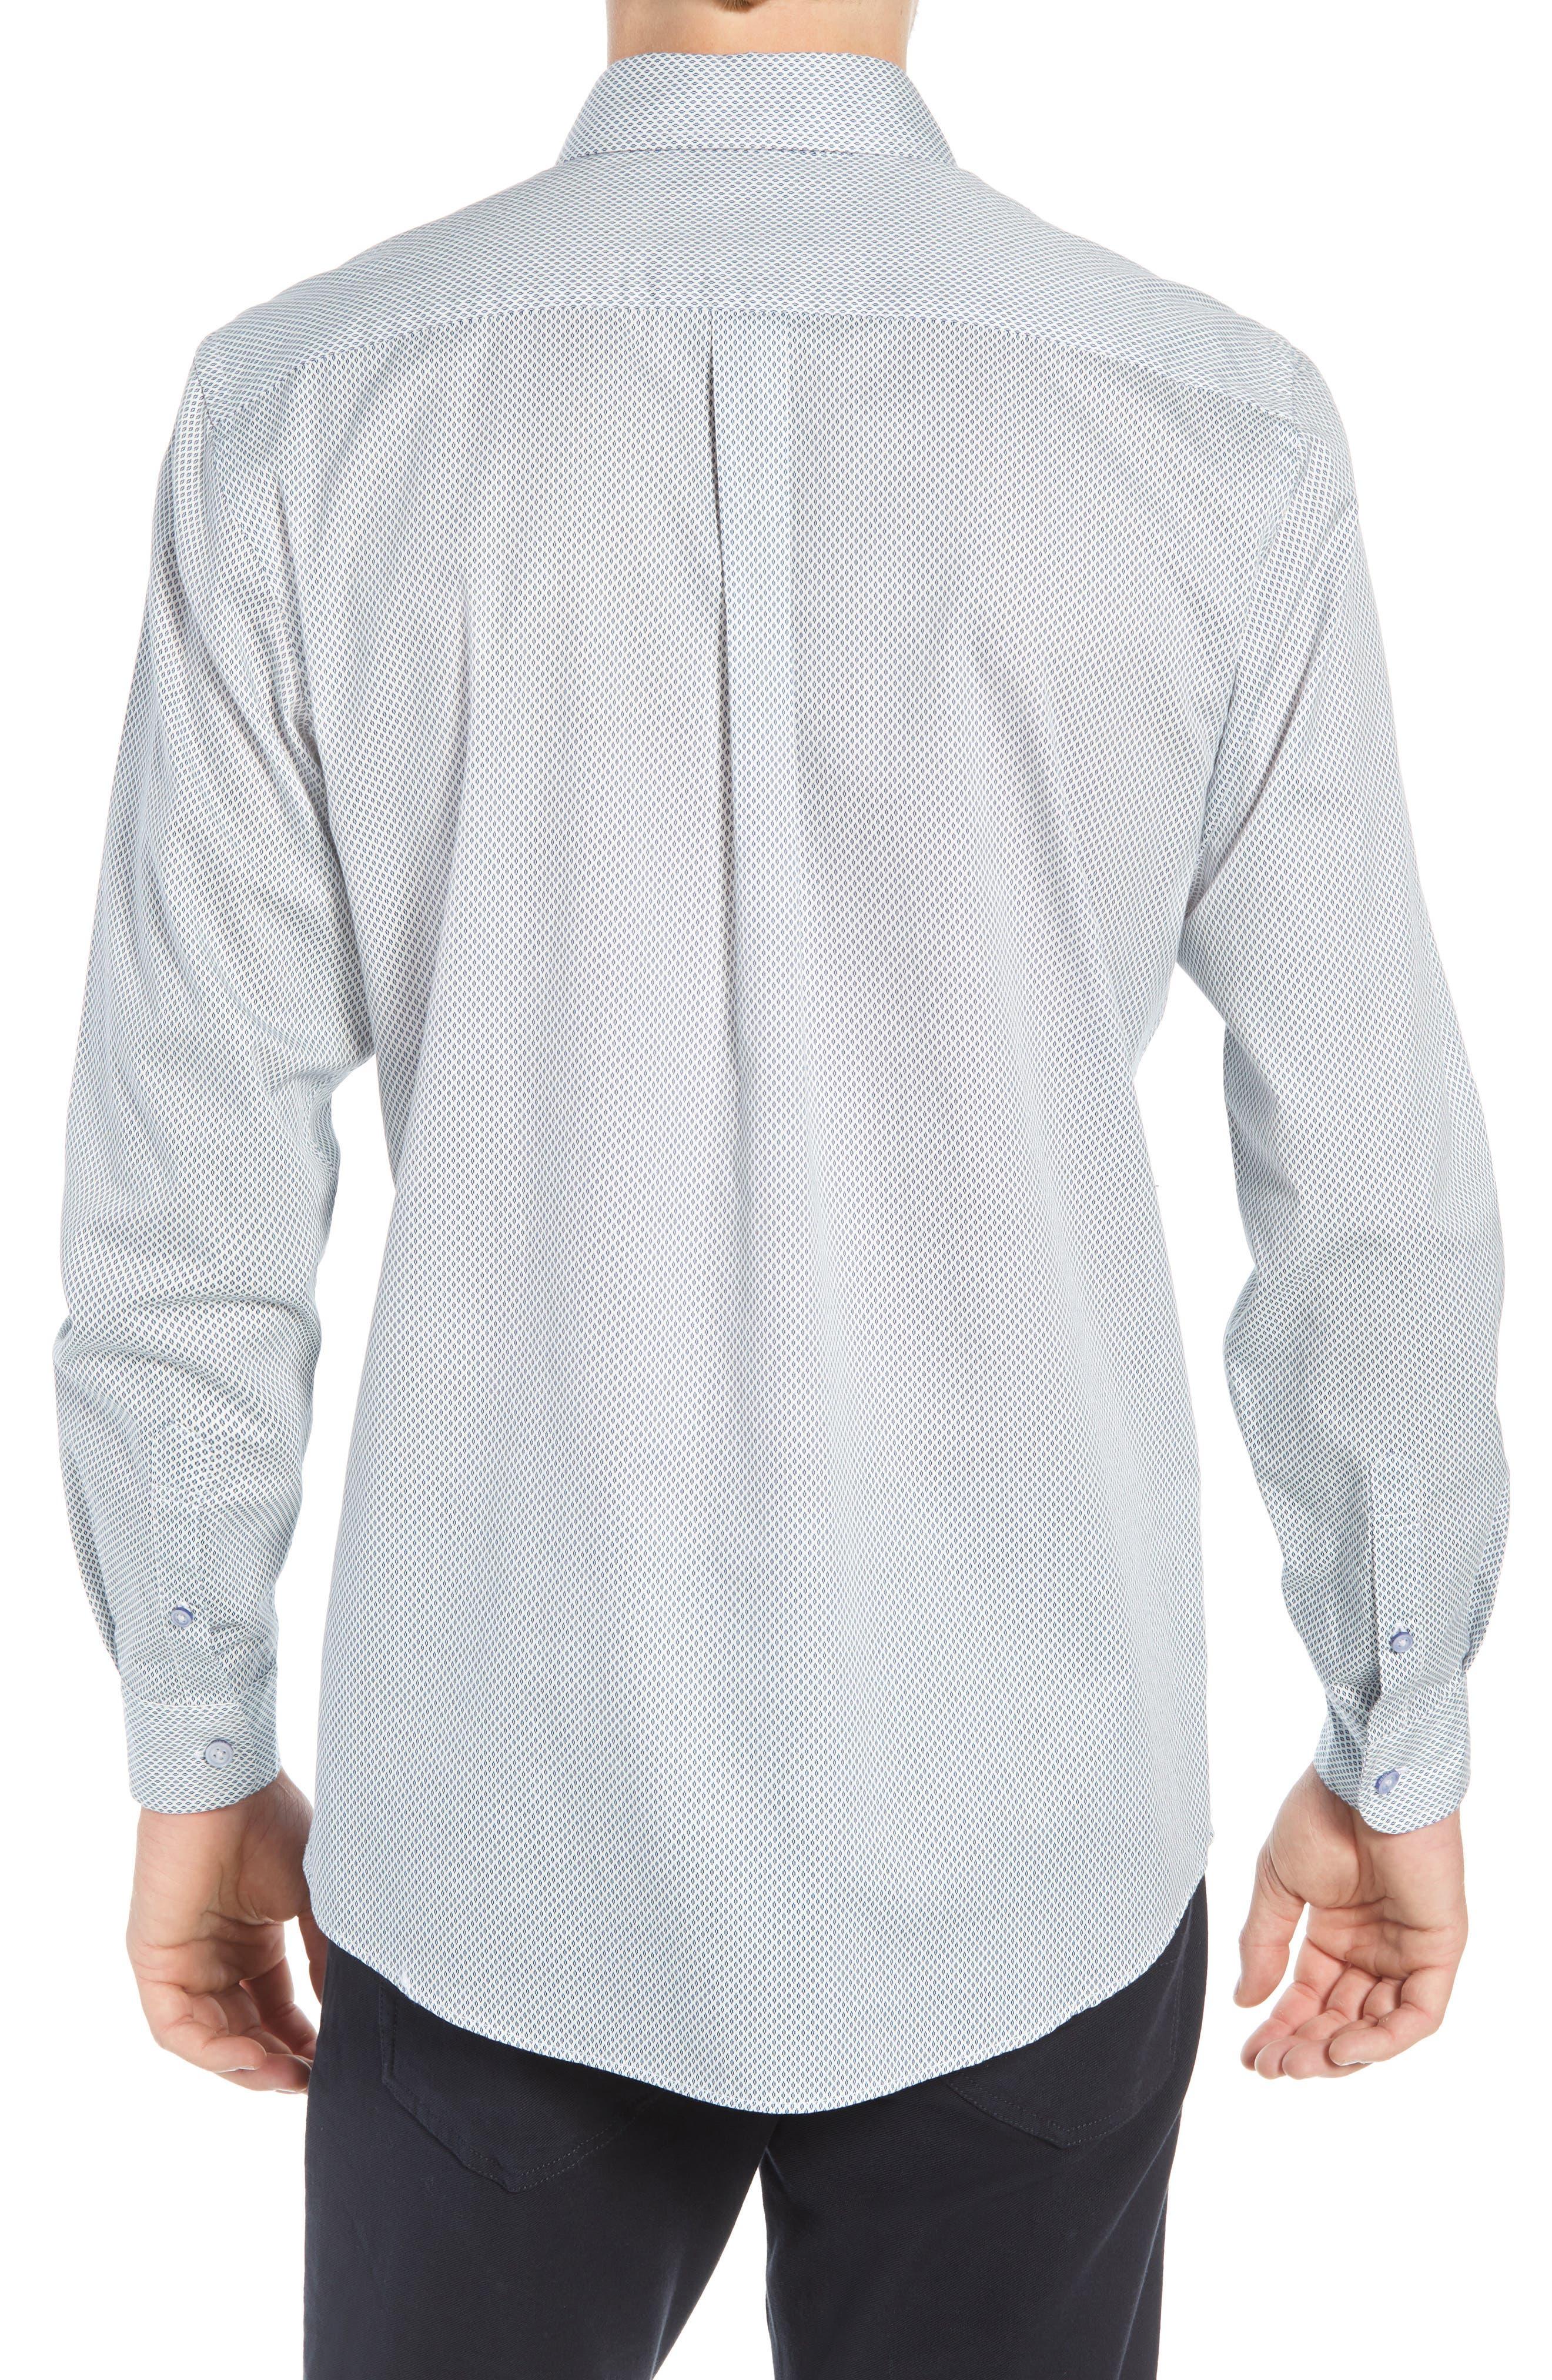 RODD & GUNN, Helston Way Regular Fit Sport Shirt, Alternate thumbnail 3, color, SNOW